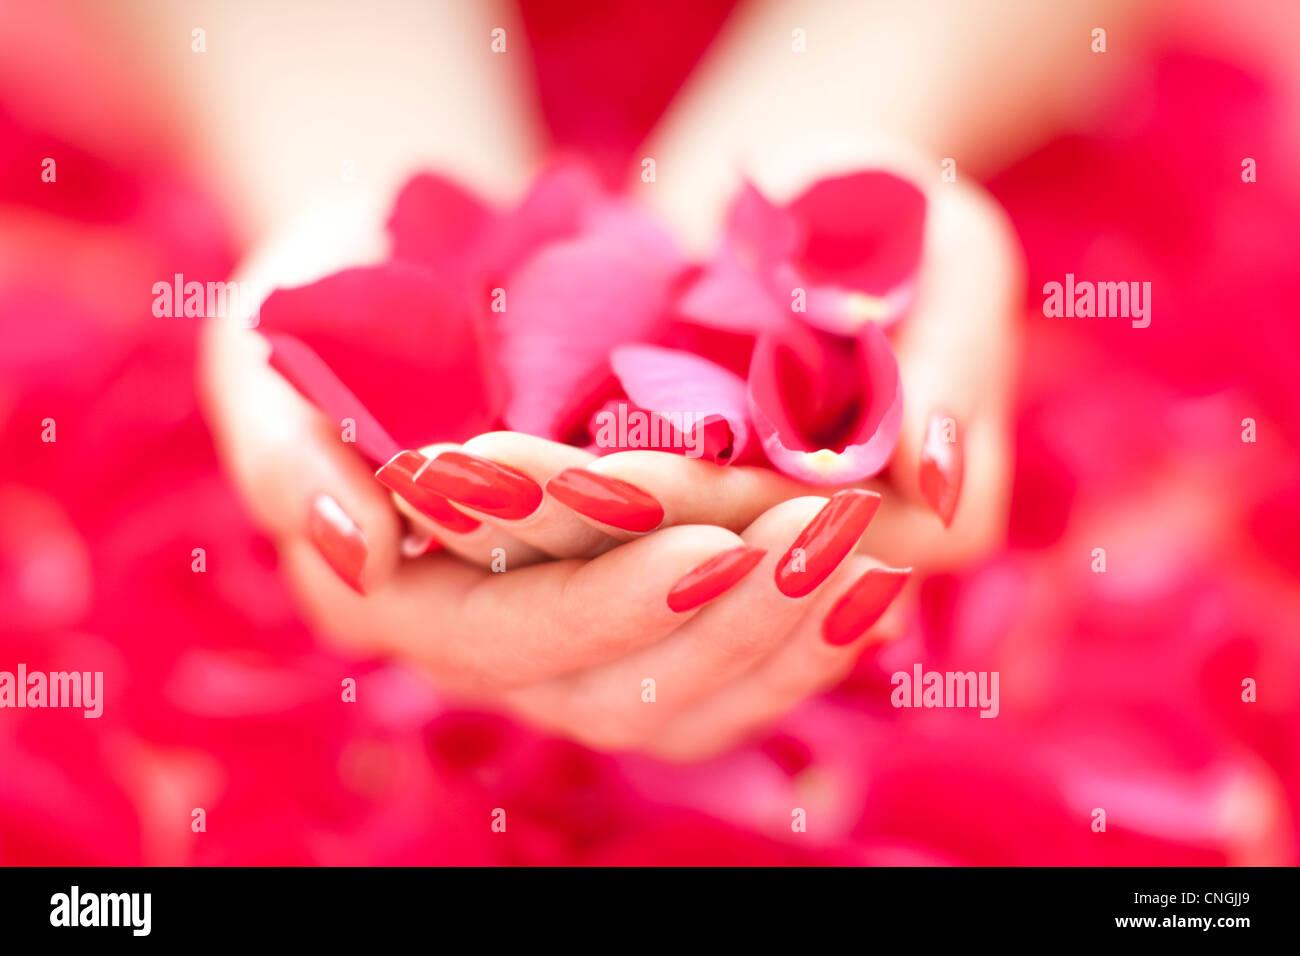 Image romantique Photo Stock